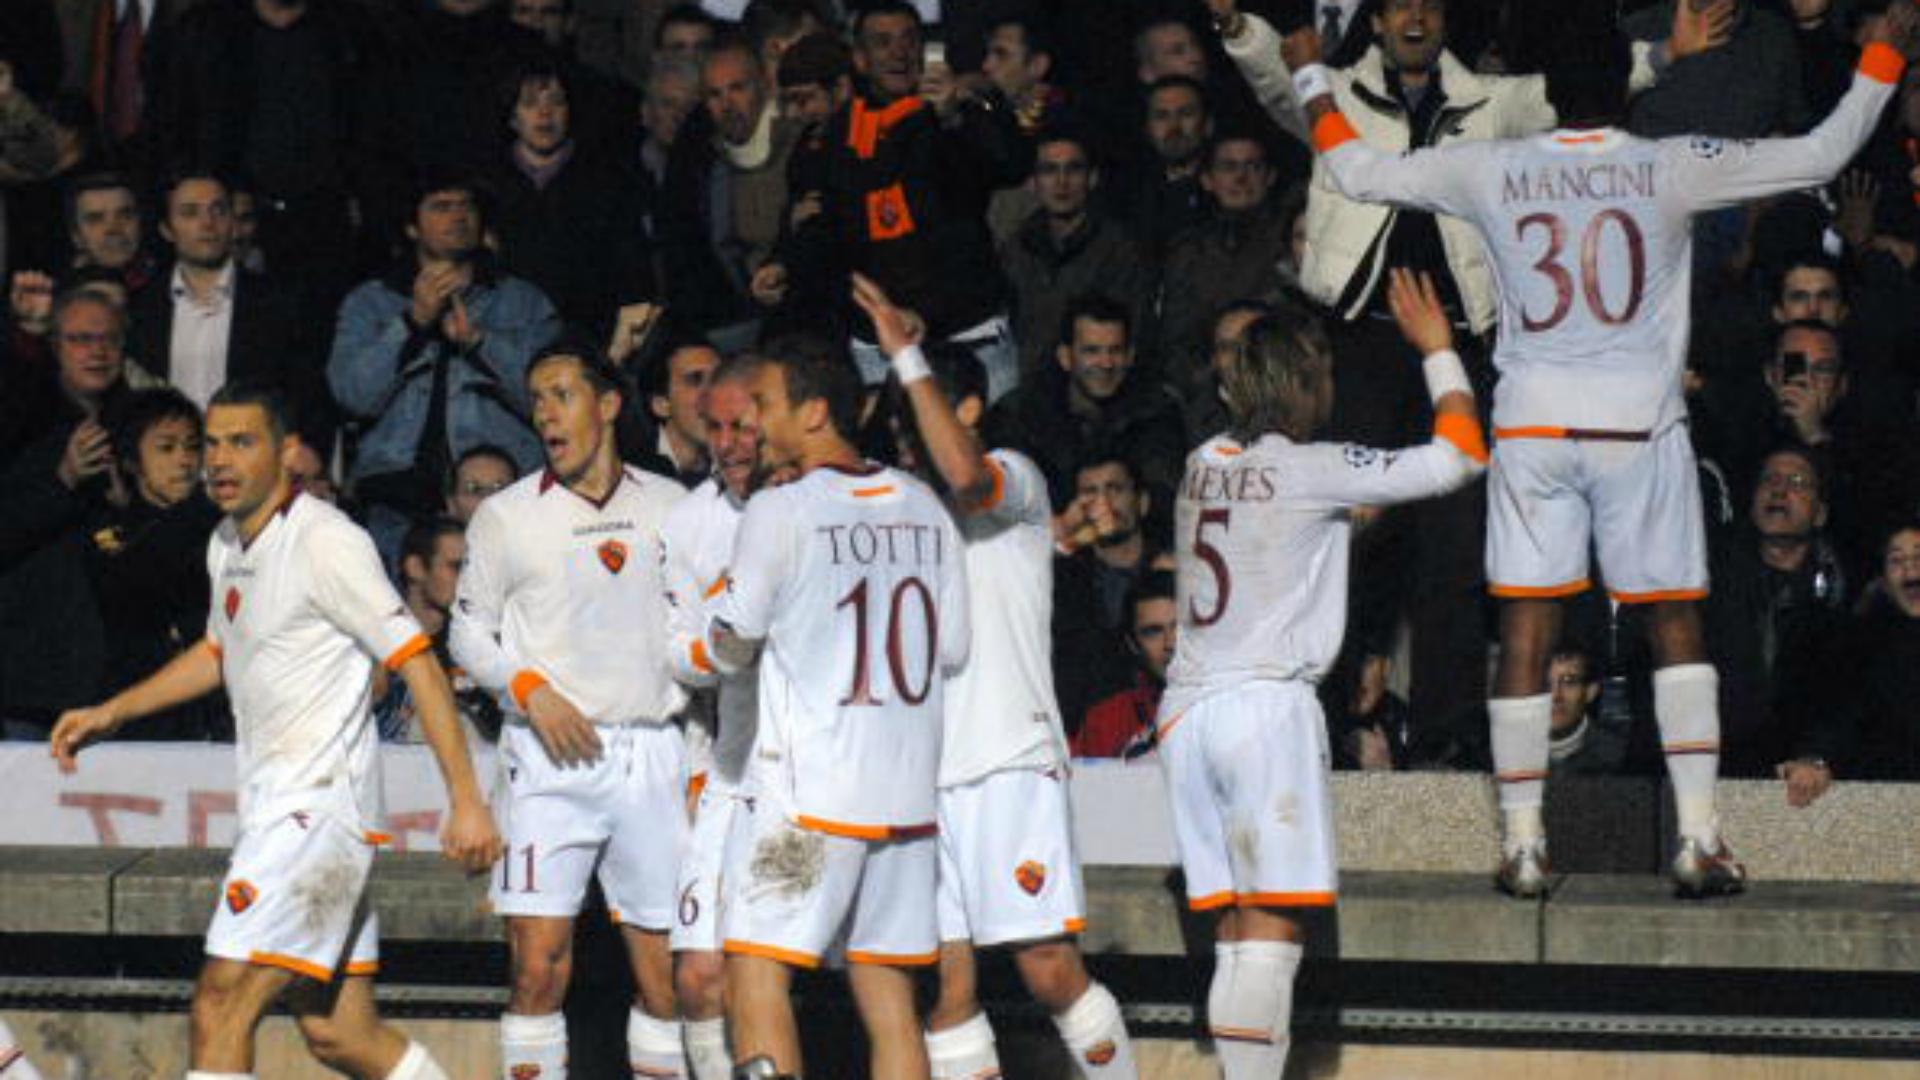 Lione Roma Champions League